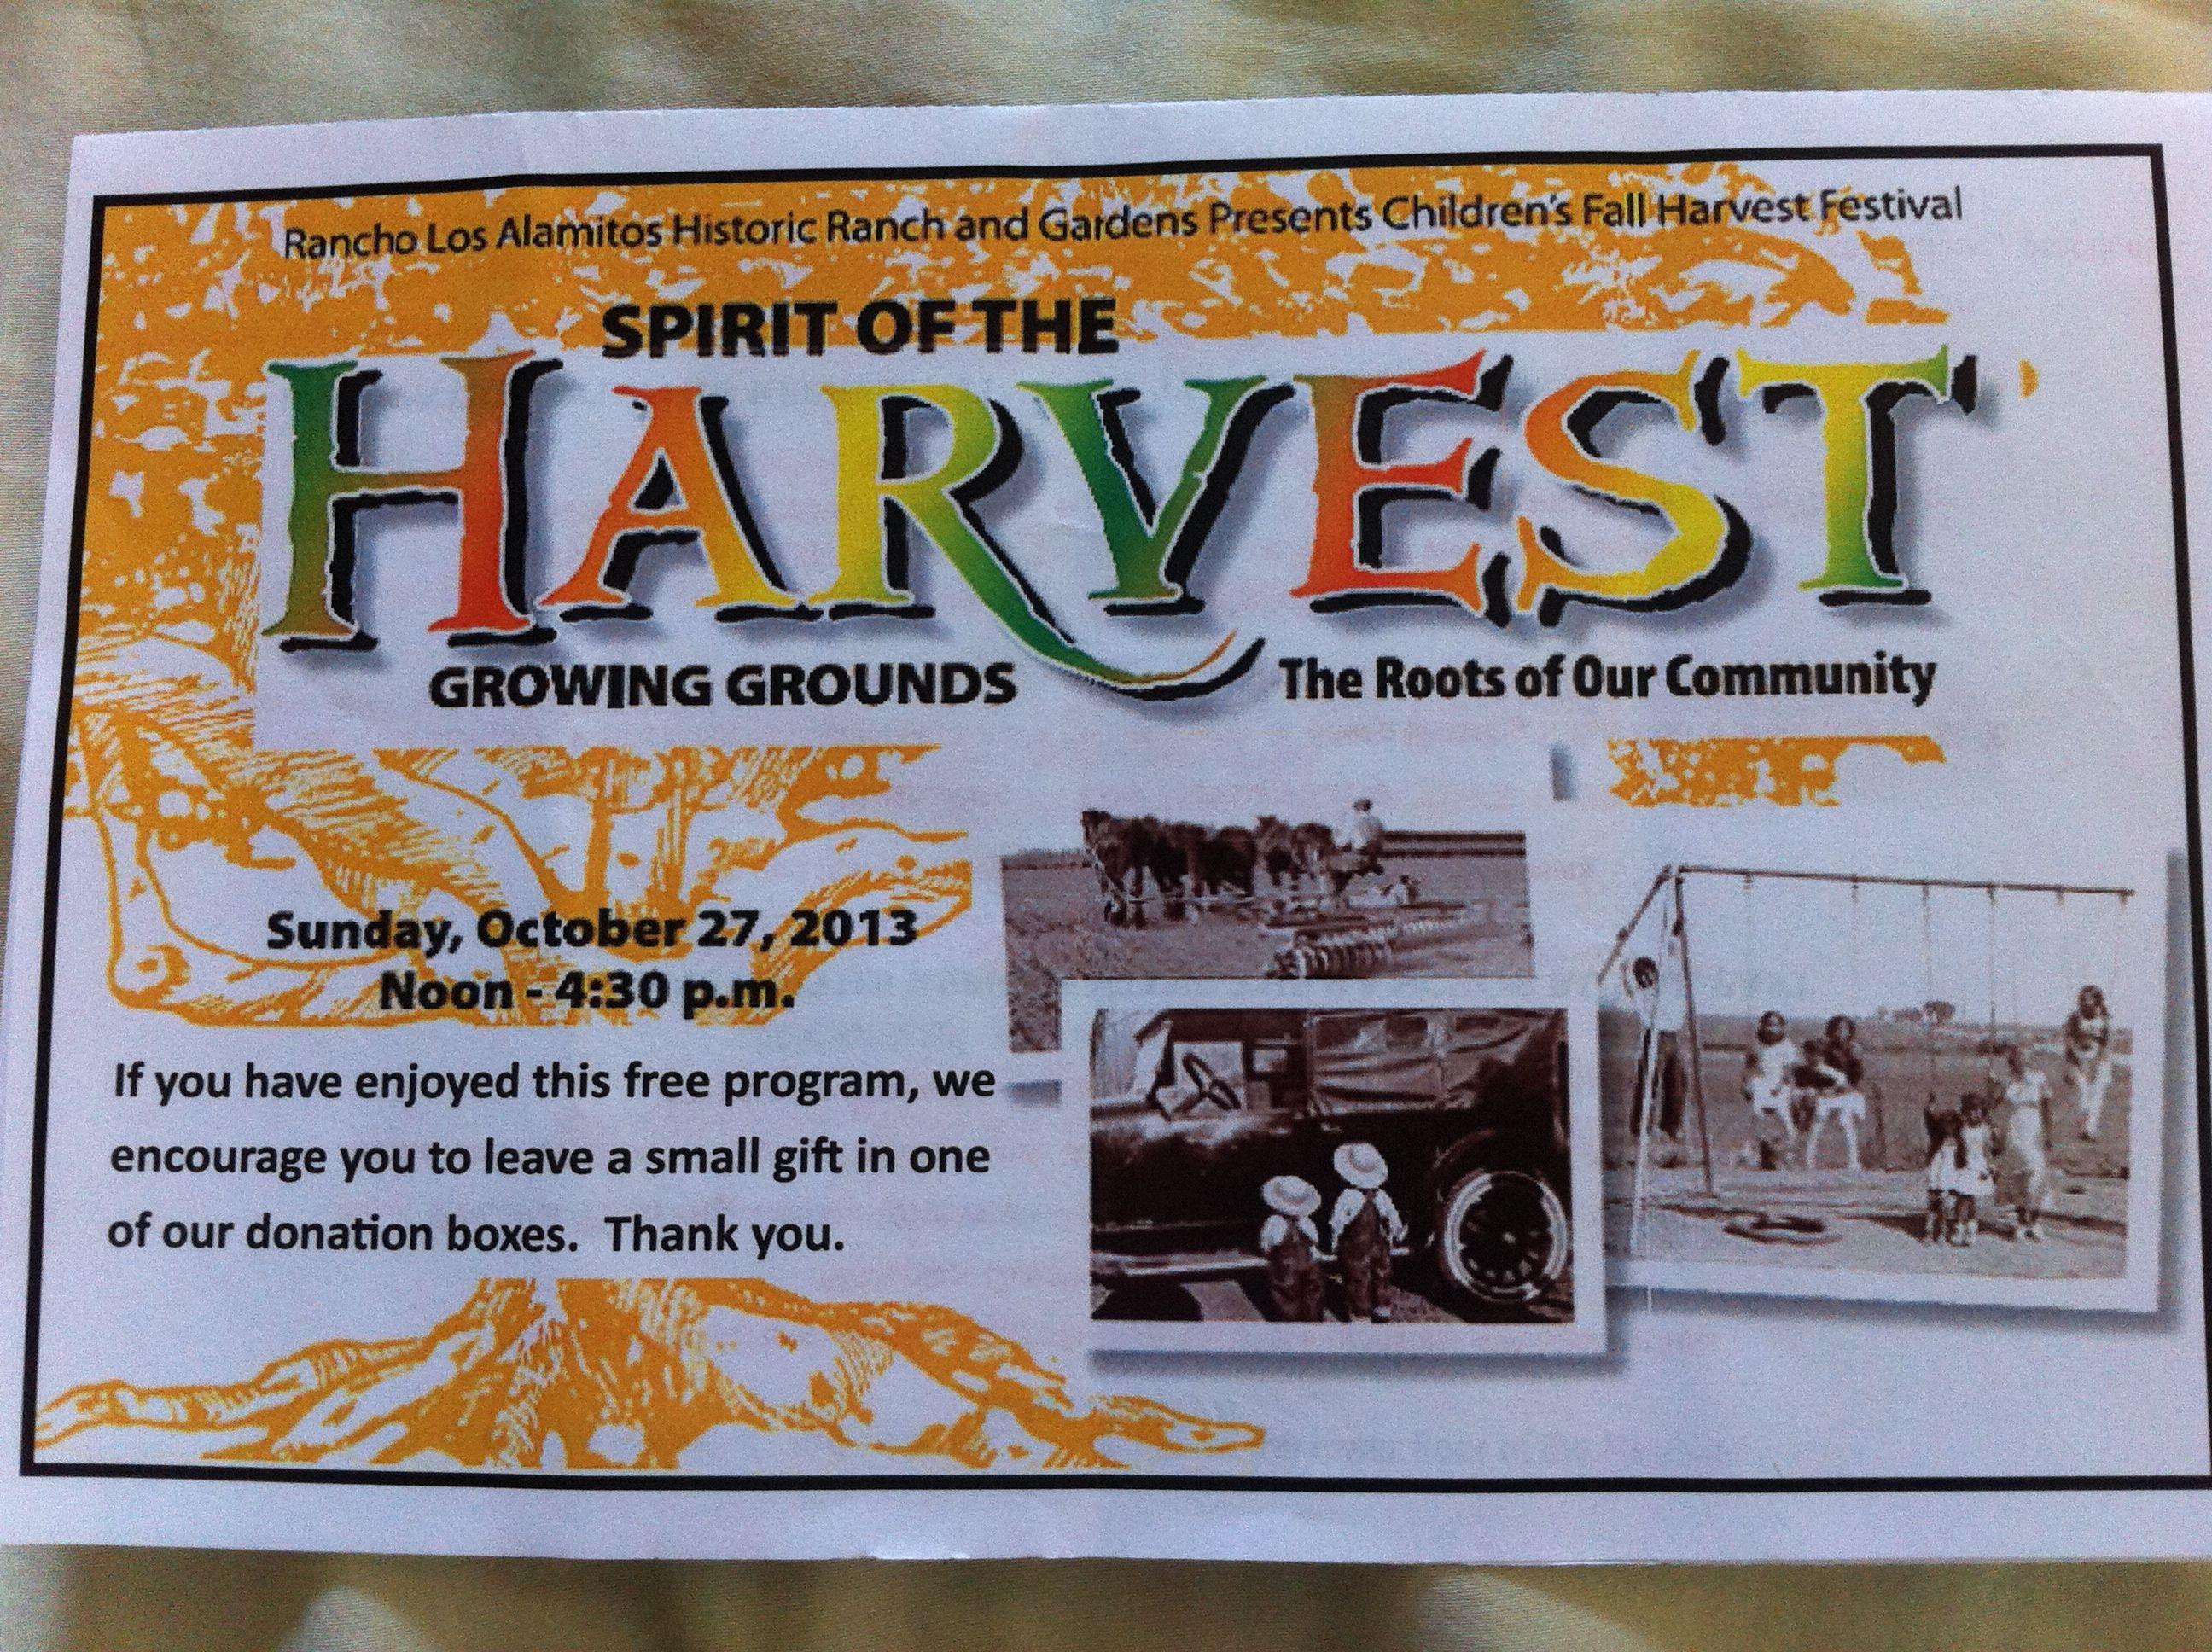 Spirit of the harvest childrenus festival at rancho losalamitos